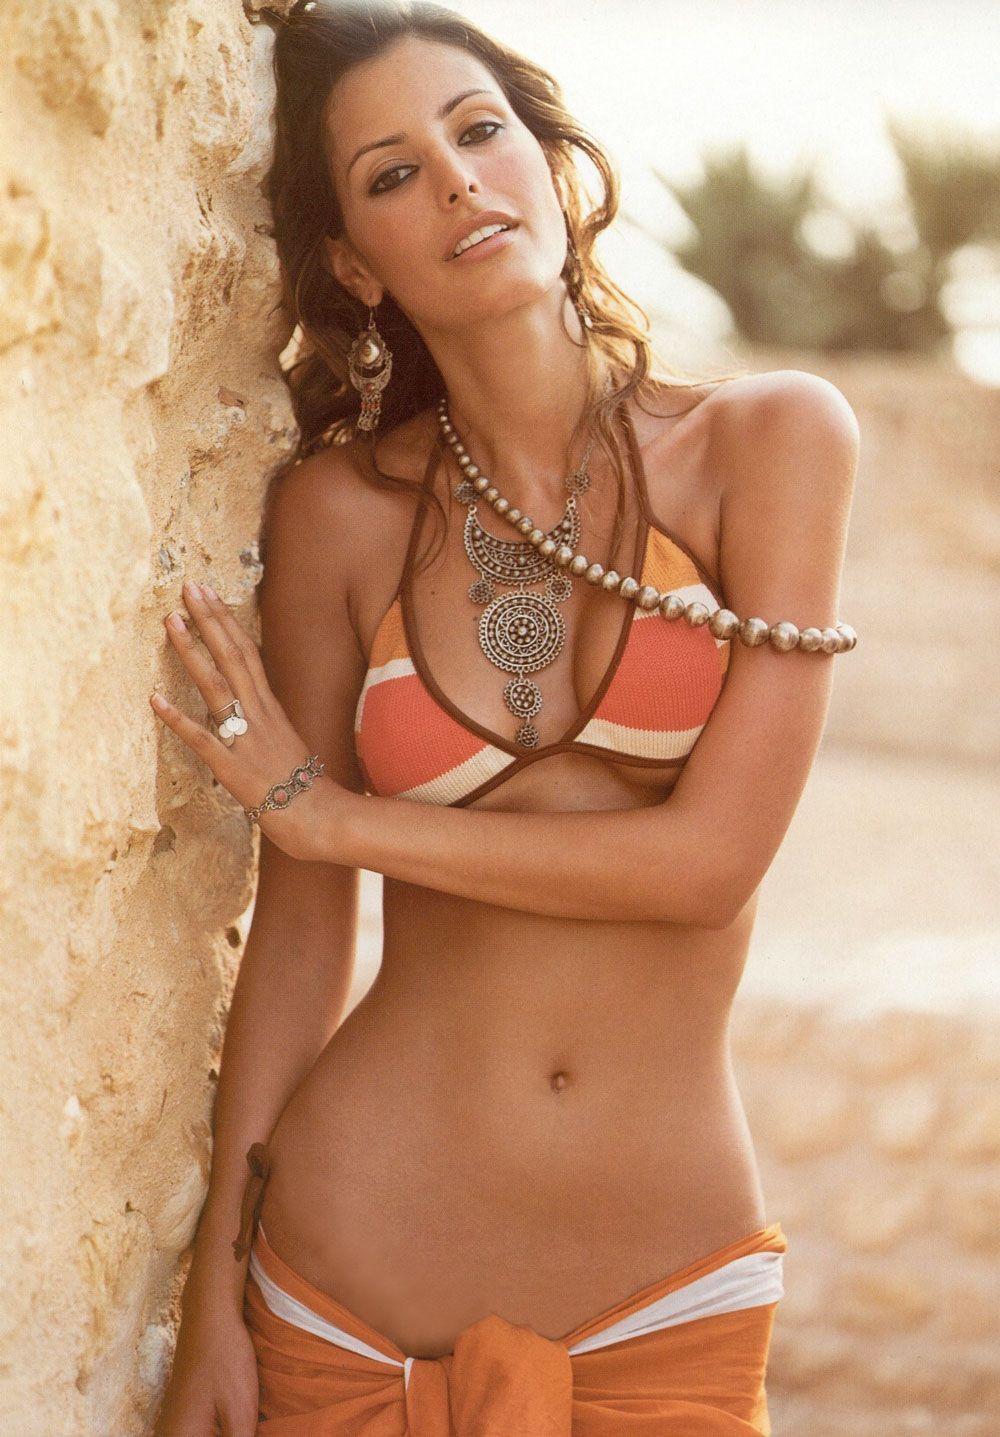 Fotos Elsa Benitez nude (55 foto and video), Ass, Leaked, Feet, in bikini 2019